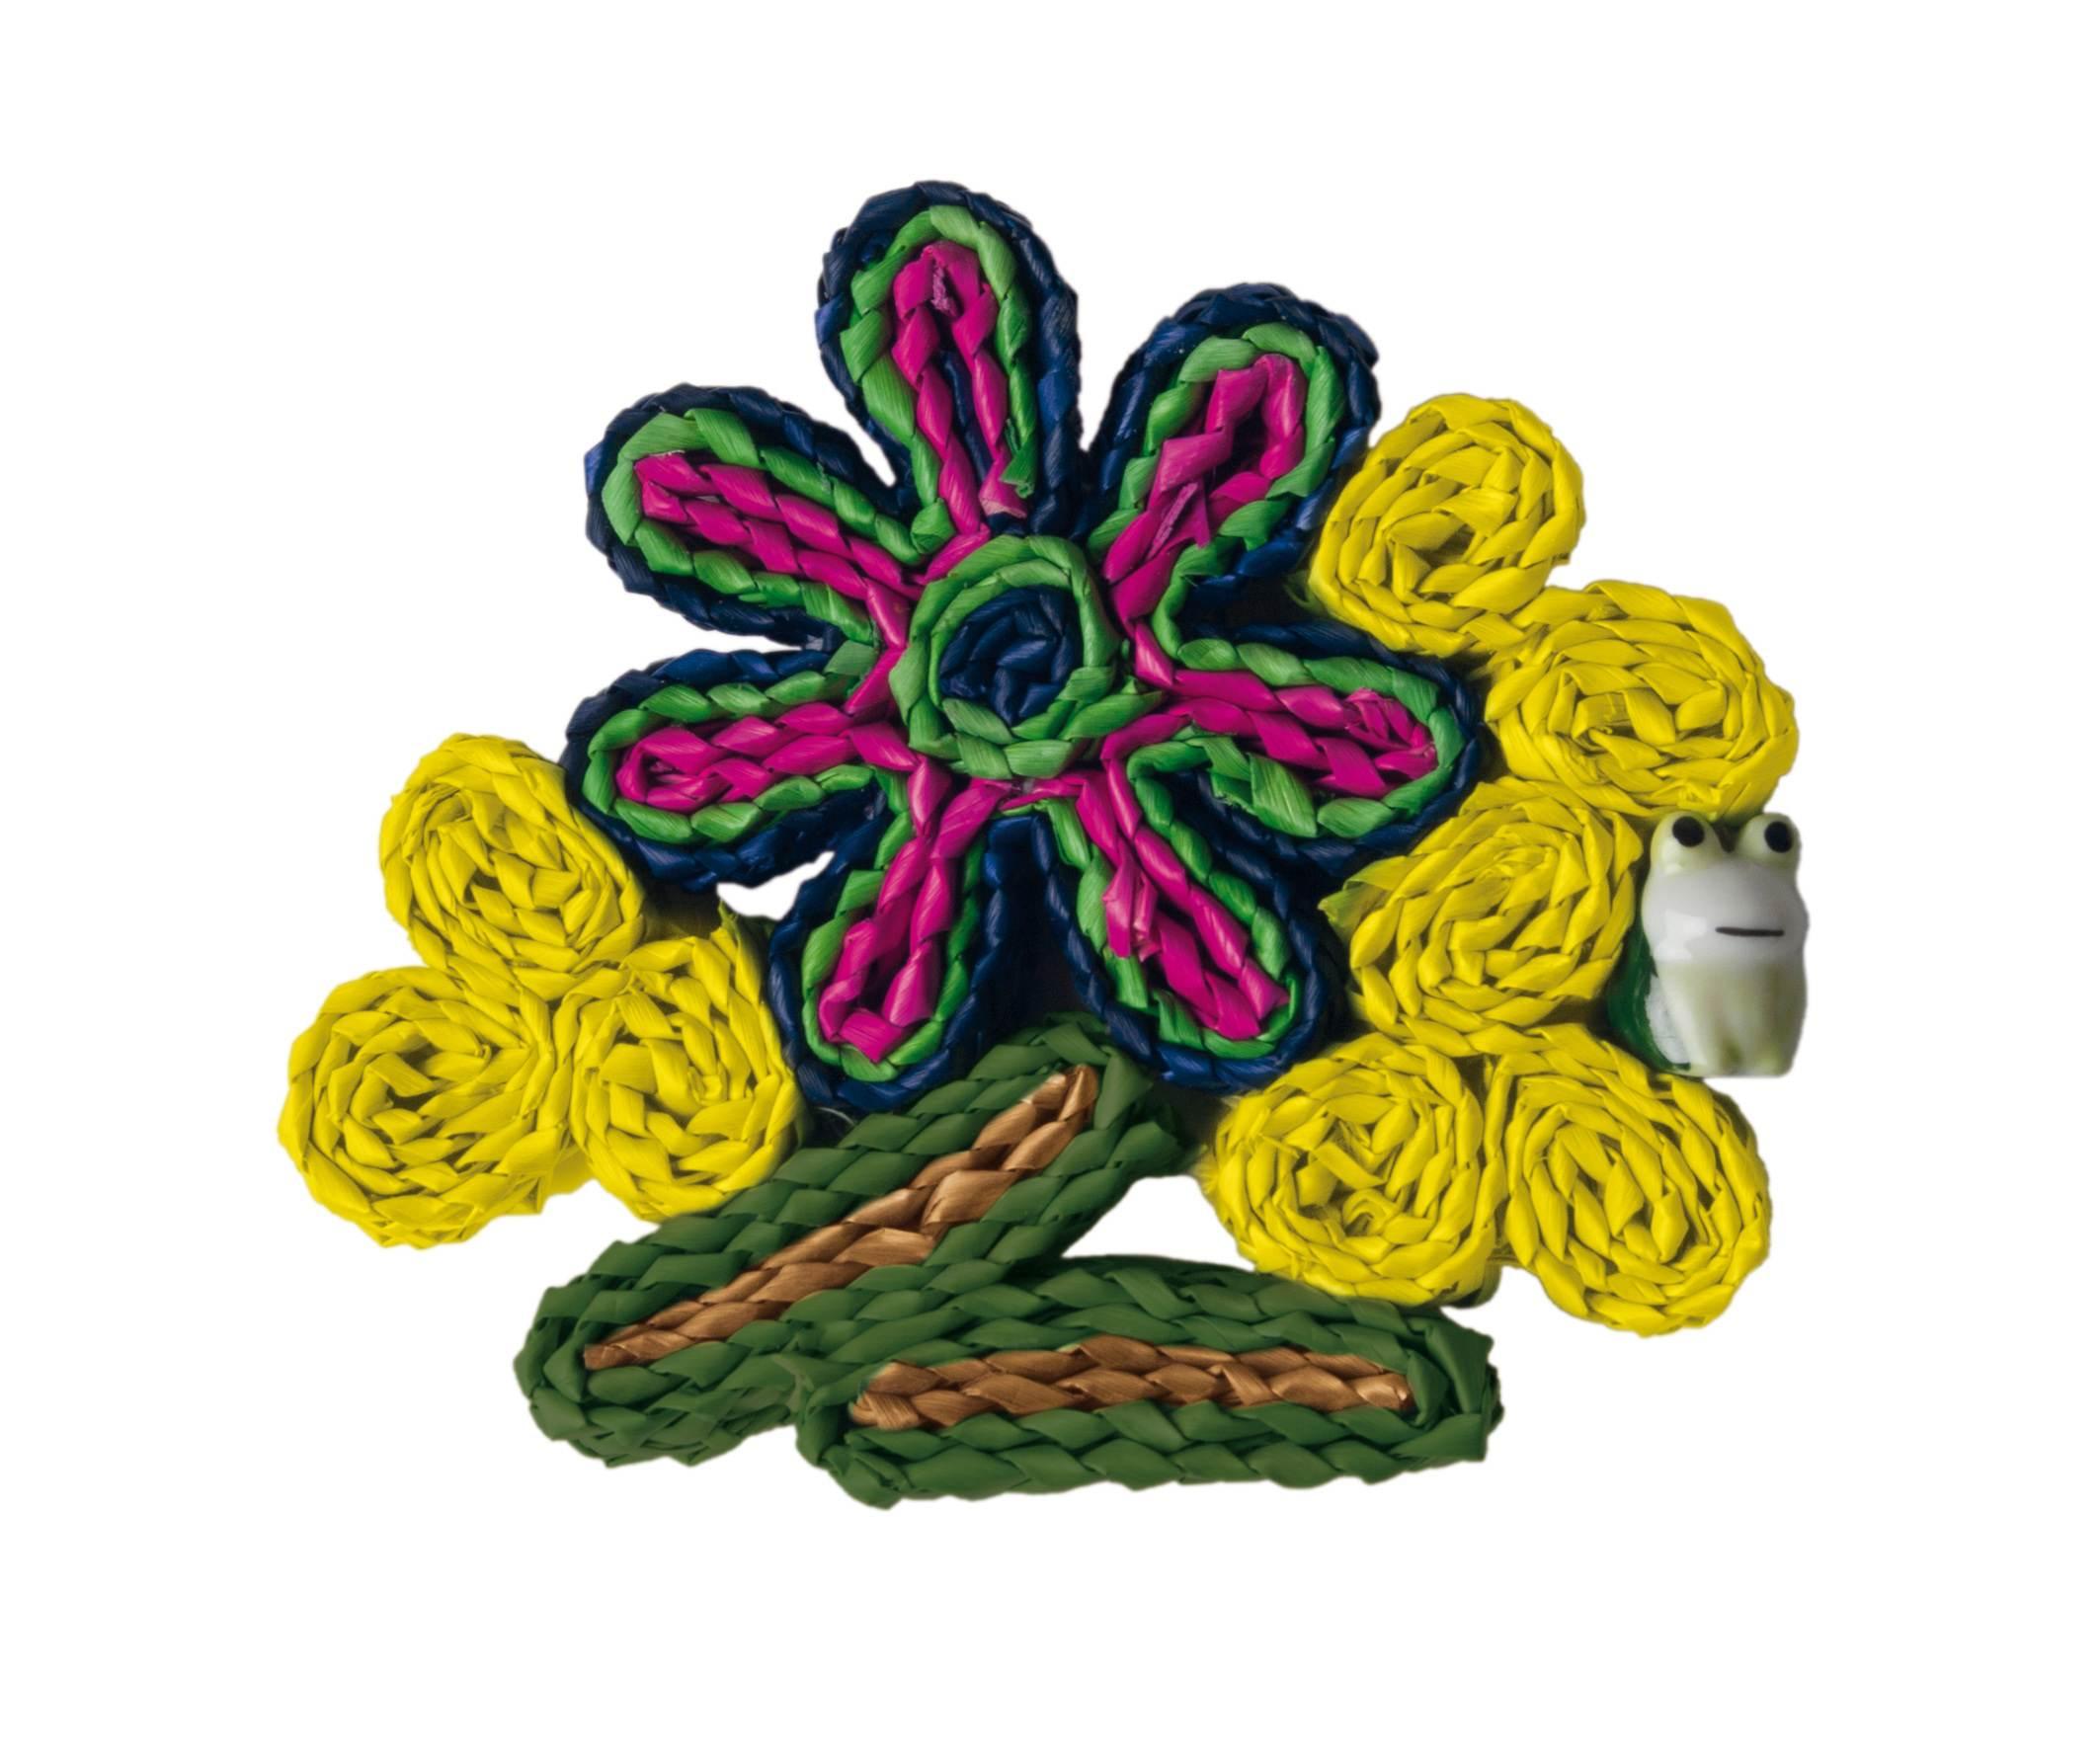 Florigraphie sottobicchieri